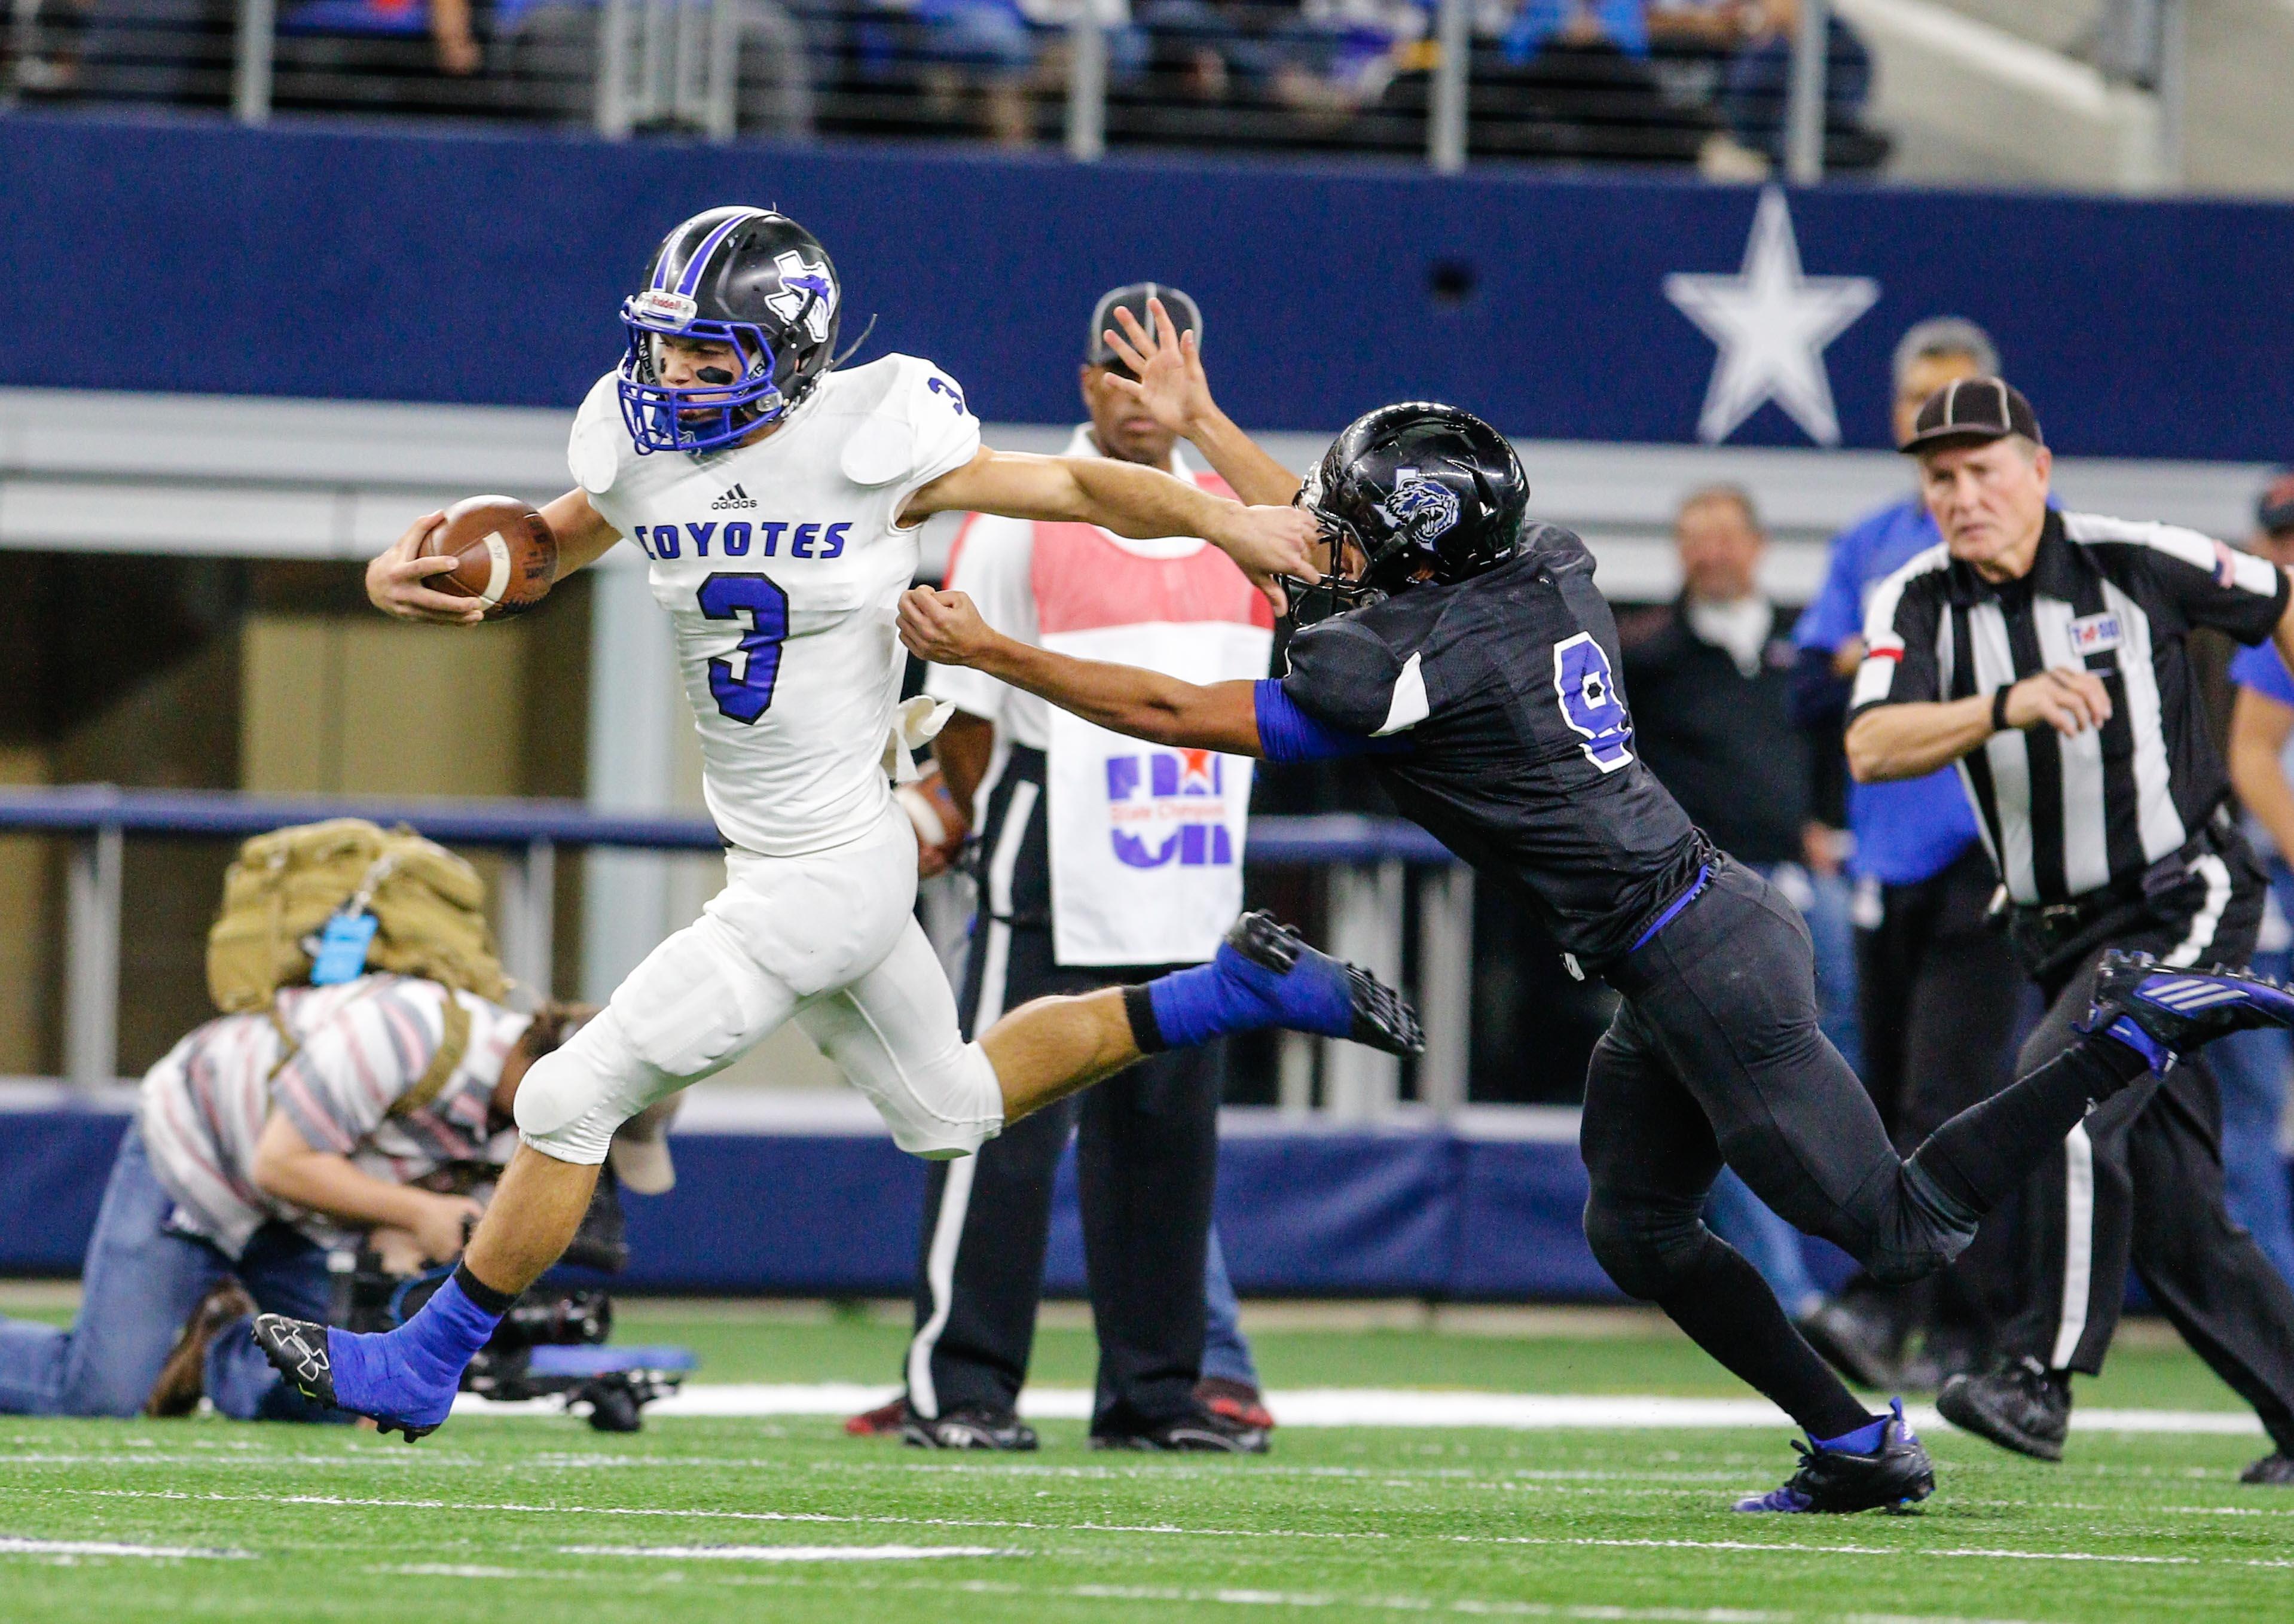 December 14, 2016 - Texas UIL State 1A Div. II championship game between Balmorhea and Richland Springs at AT&T Stadium in Arlington, Texas. (Image Credit: John Glaser/texashsfootball.com)